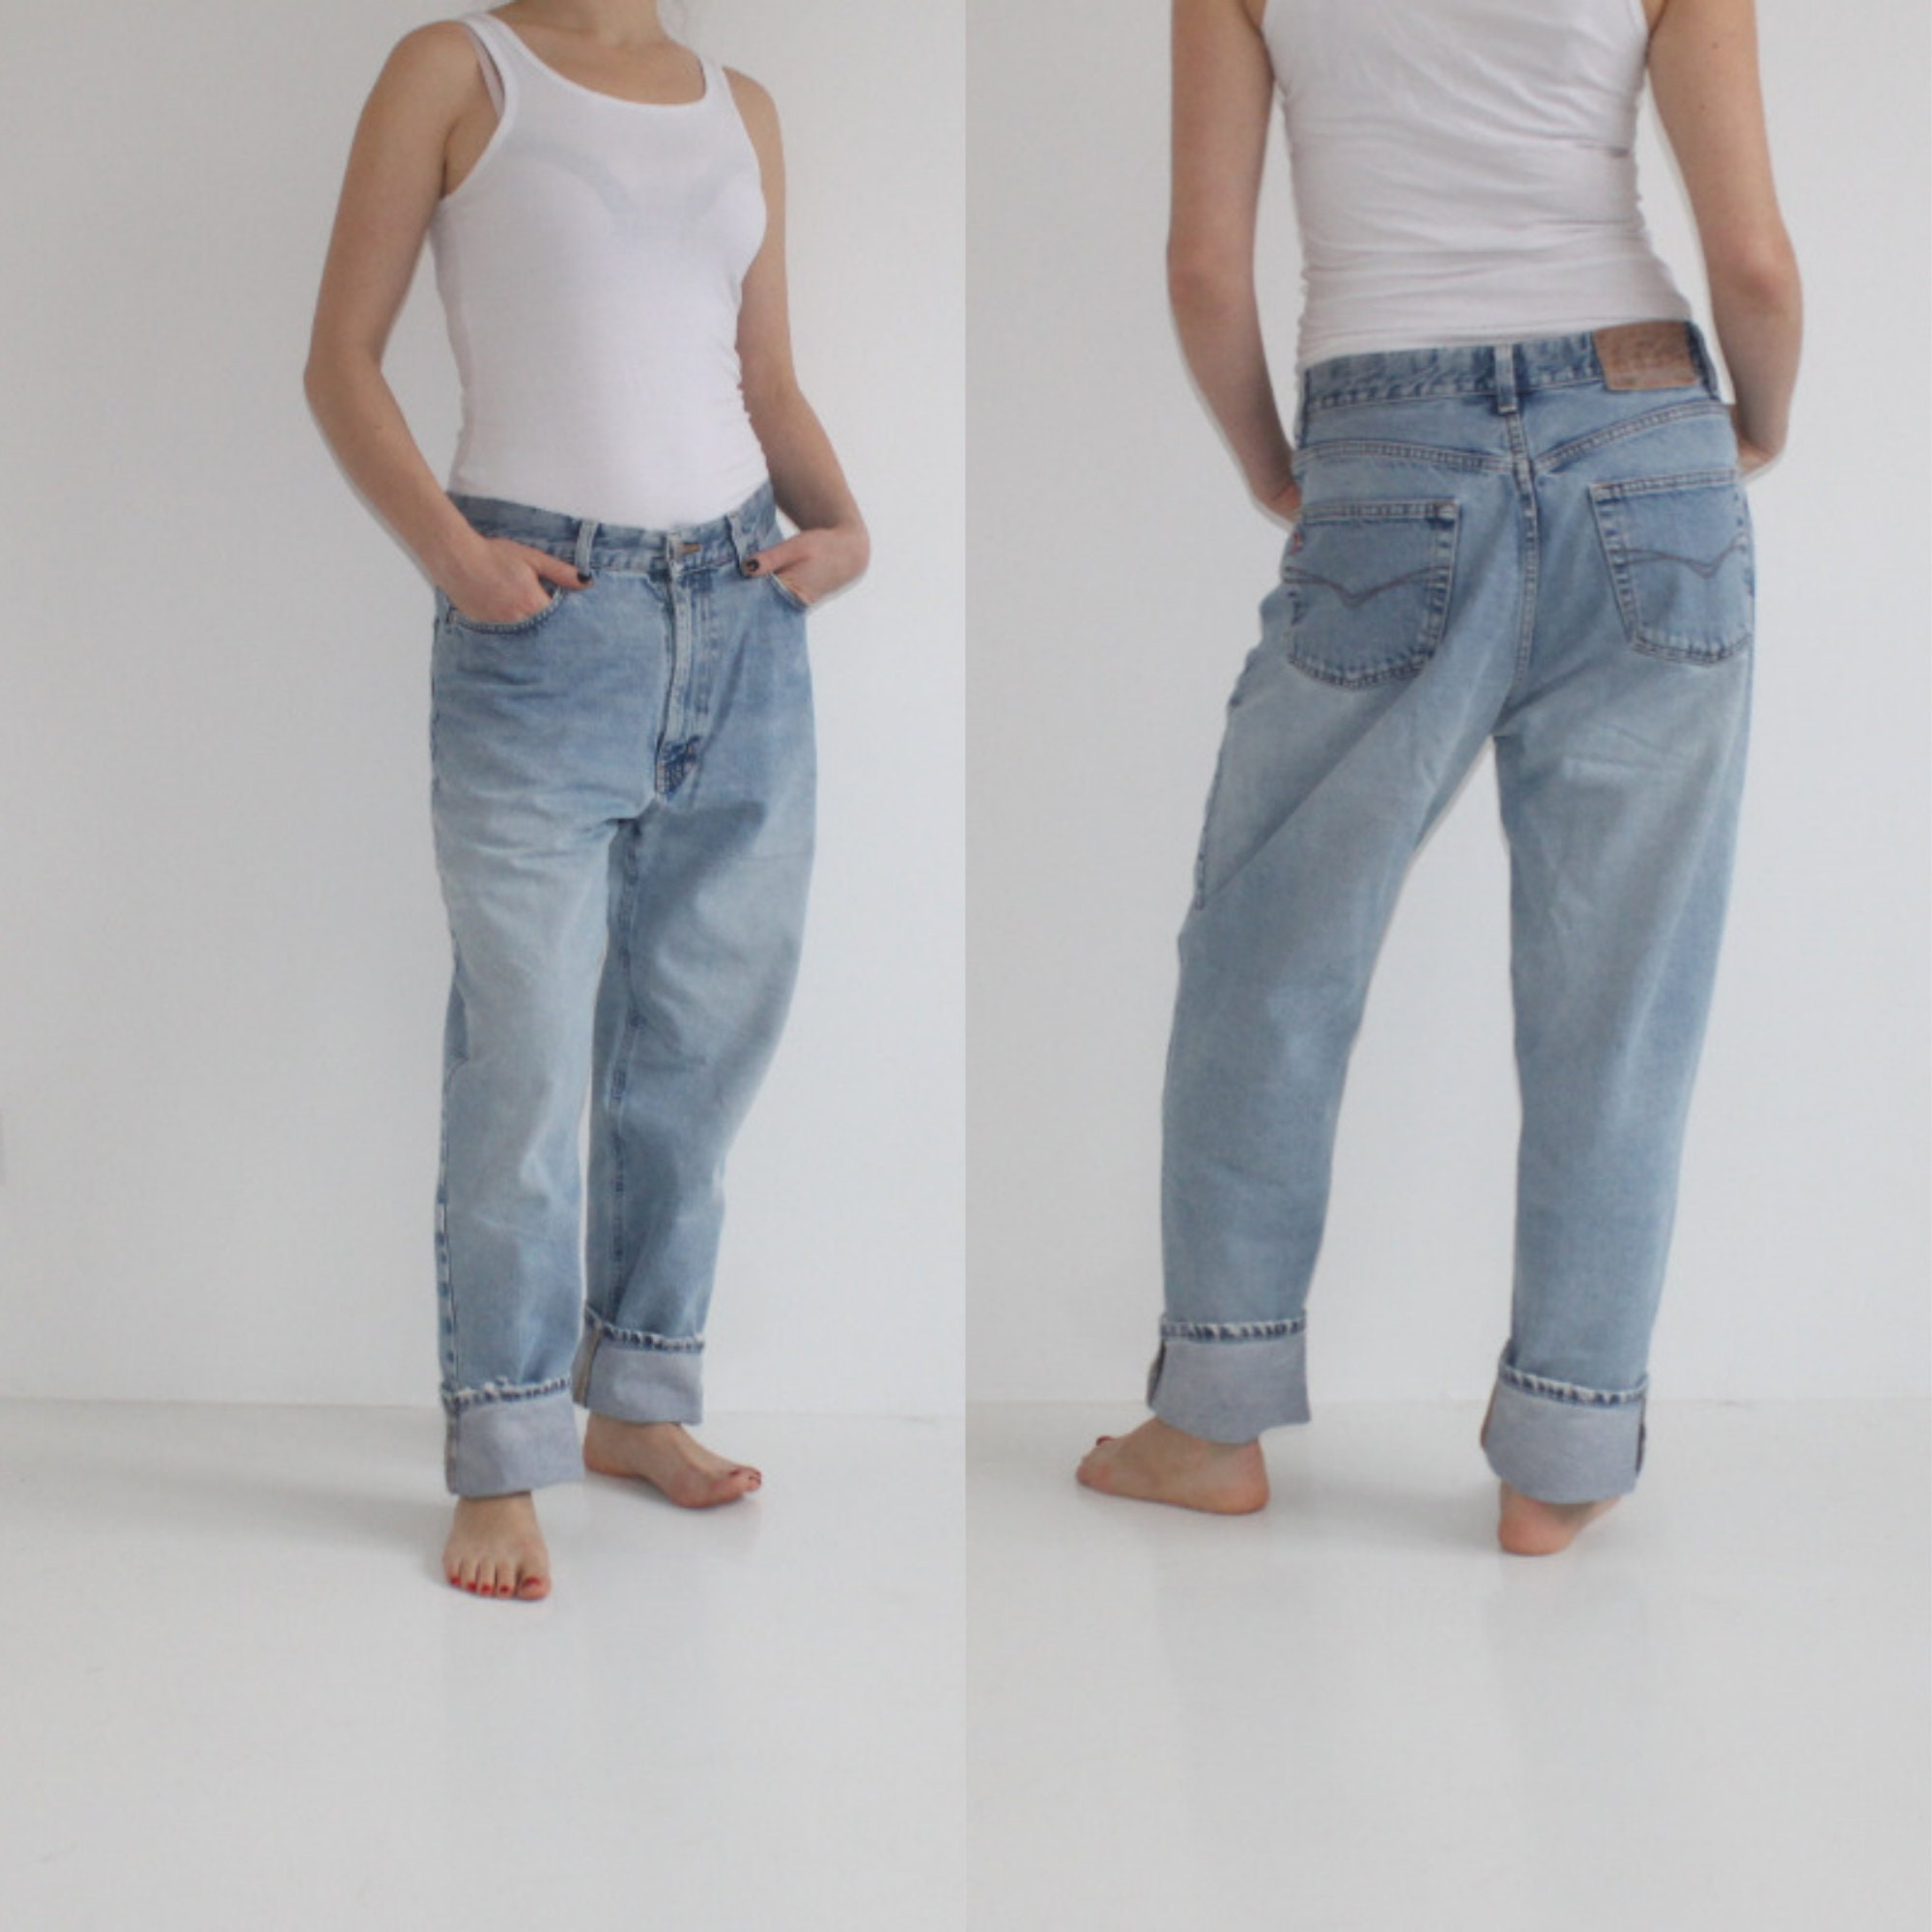 87c133678d Vintage 80s Acid Wash Jeans High Waist Denim Jeans Women Peg Leg Trousers  High Waisted Jeans Hipster ...